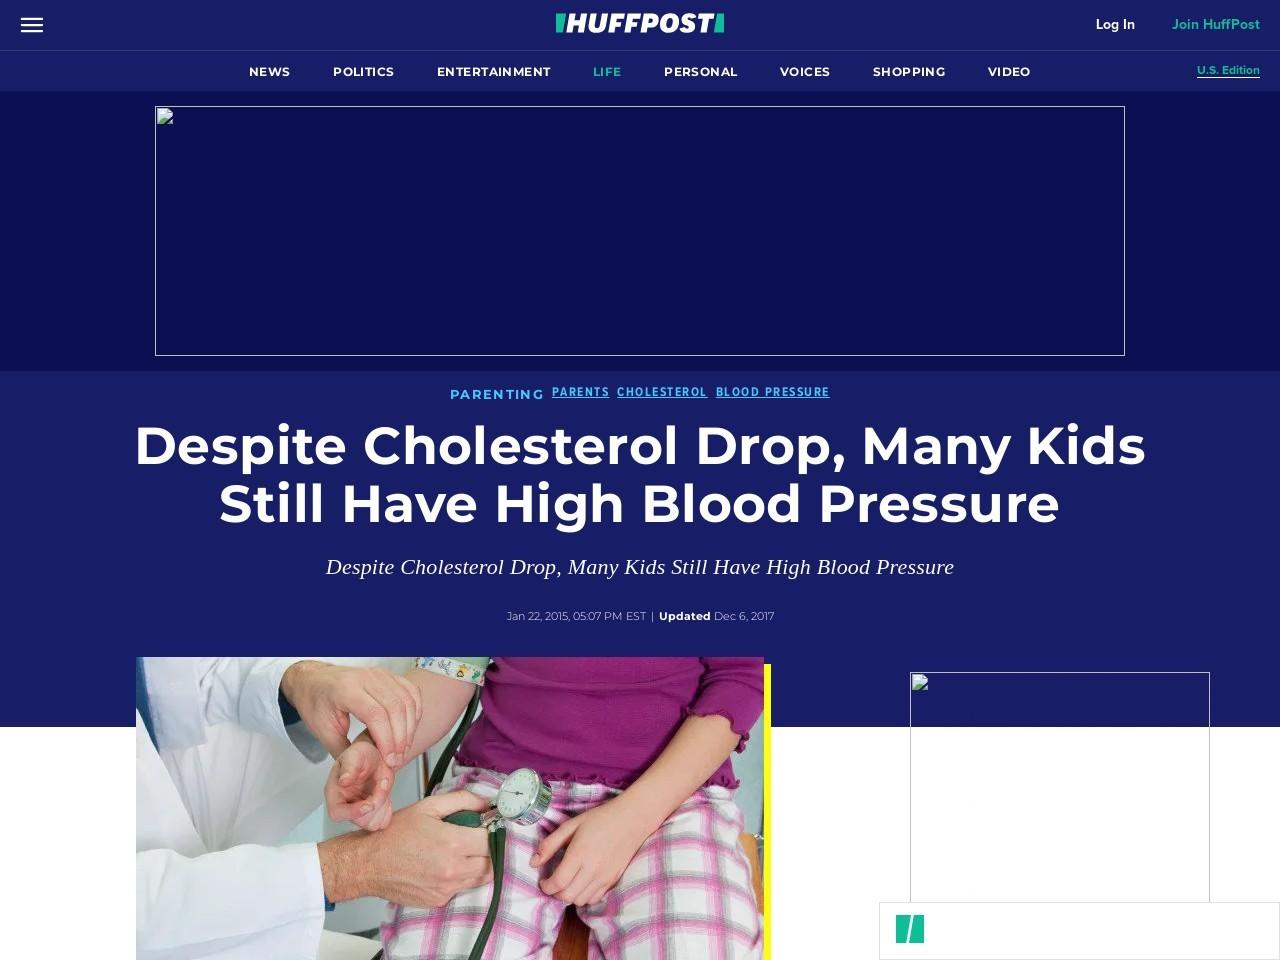 Despite Cholesterol Drop, Many Kids Still Have High Blood Pressure